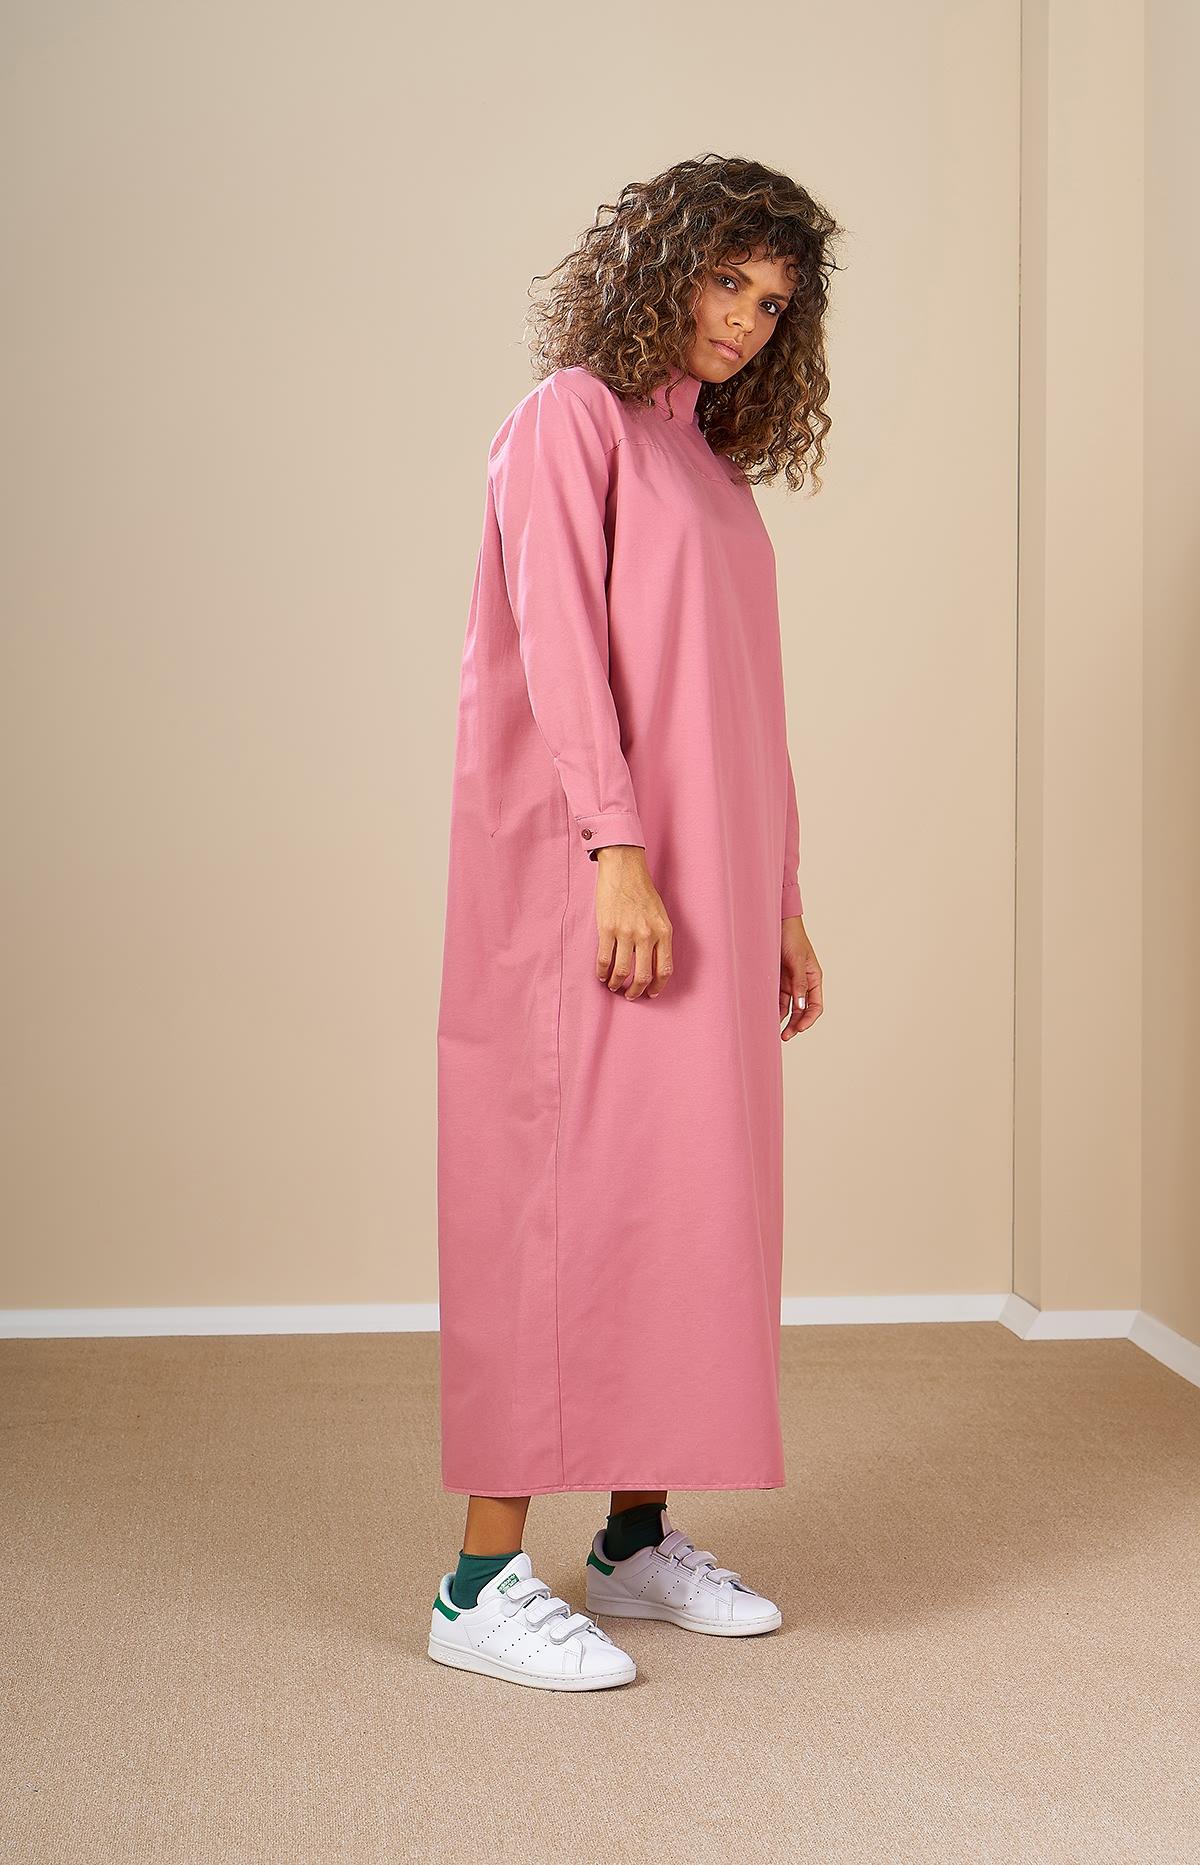 Mevra - Robalı Elbise Pudra